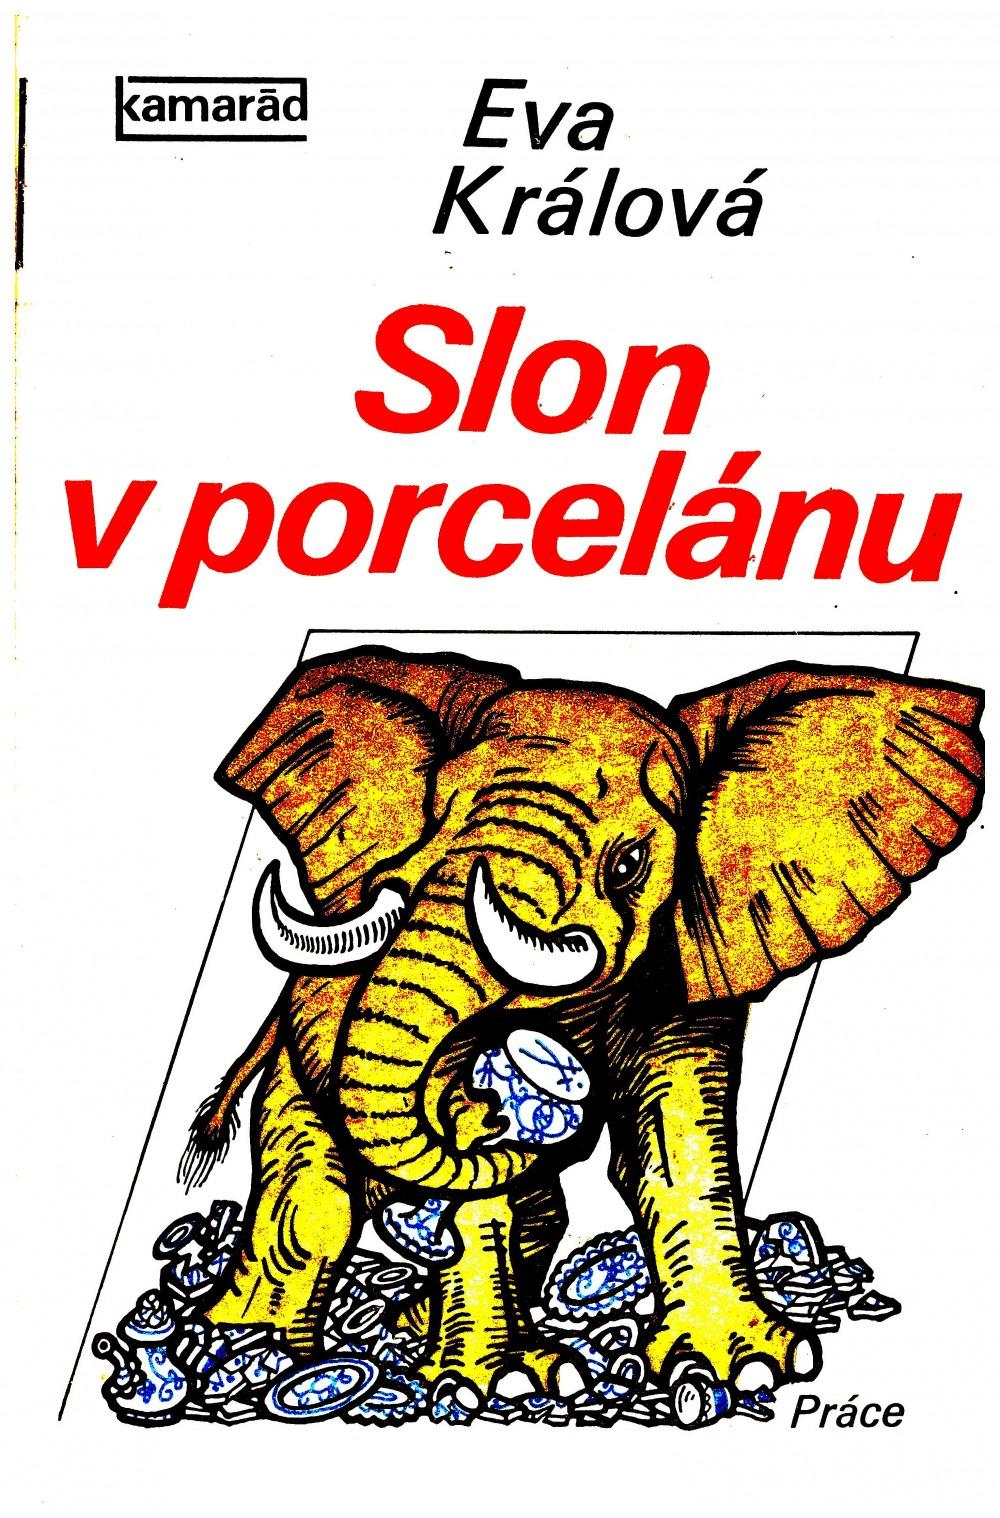 big_slon-v-porcelanu-6vj-295179